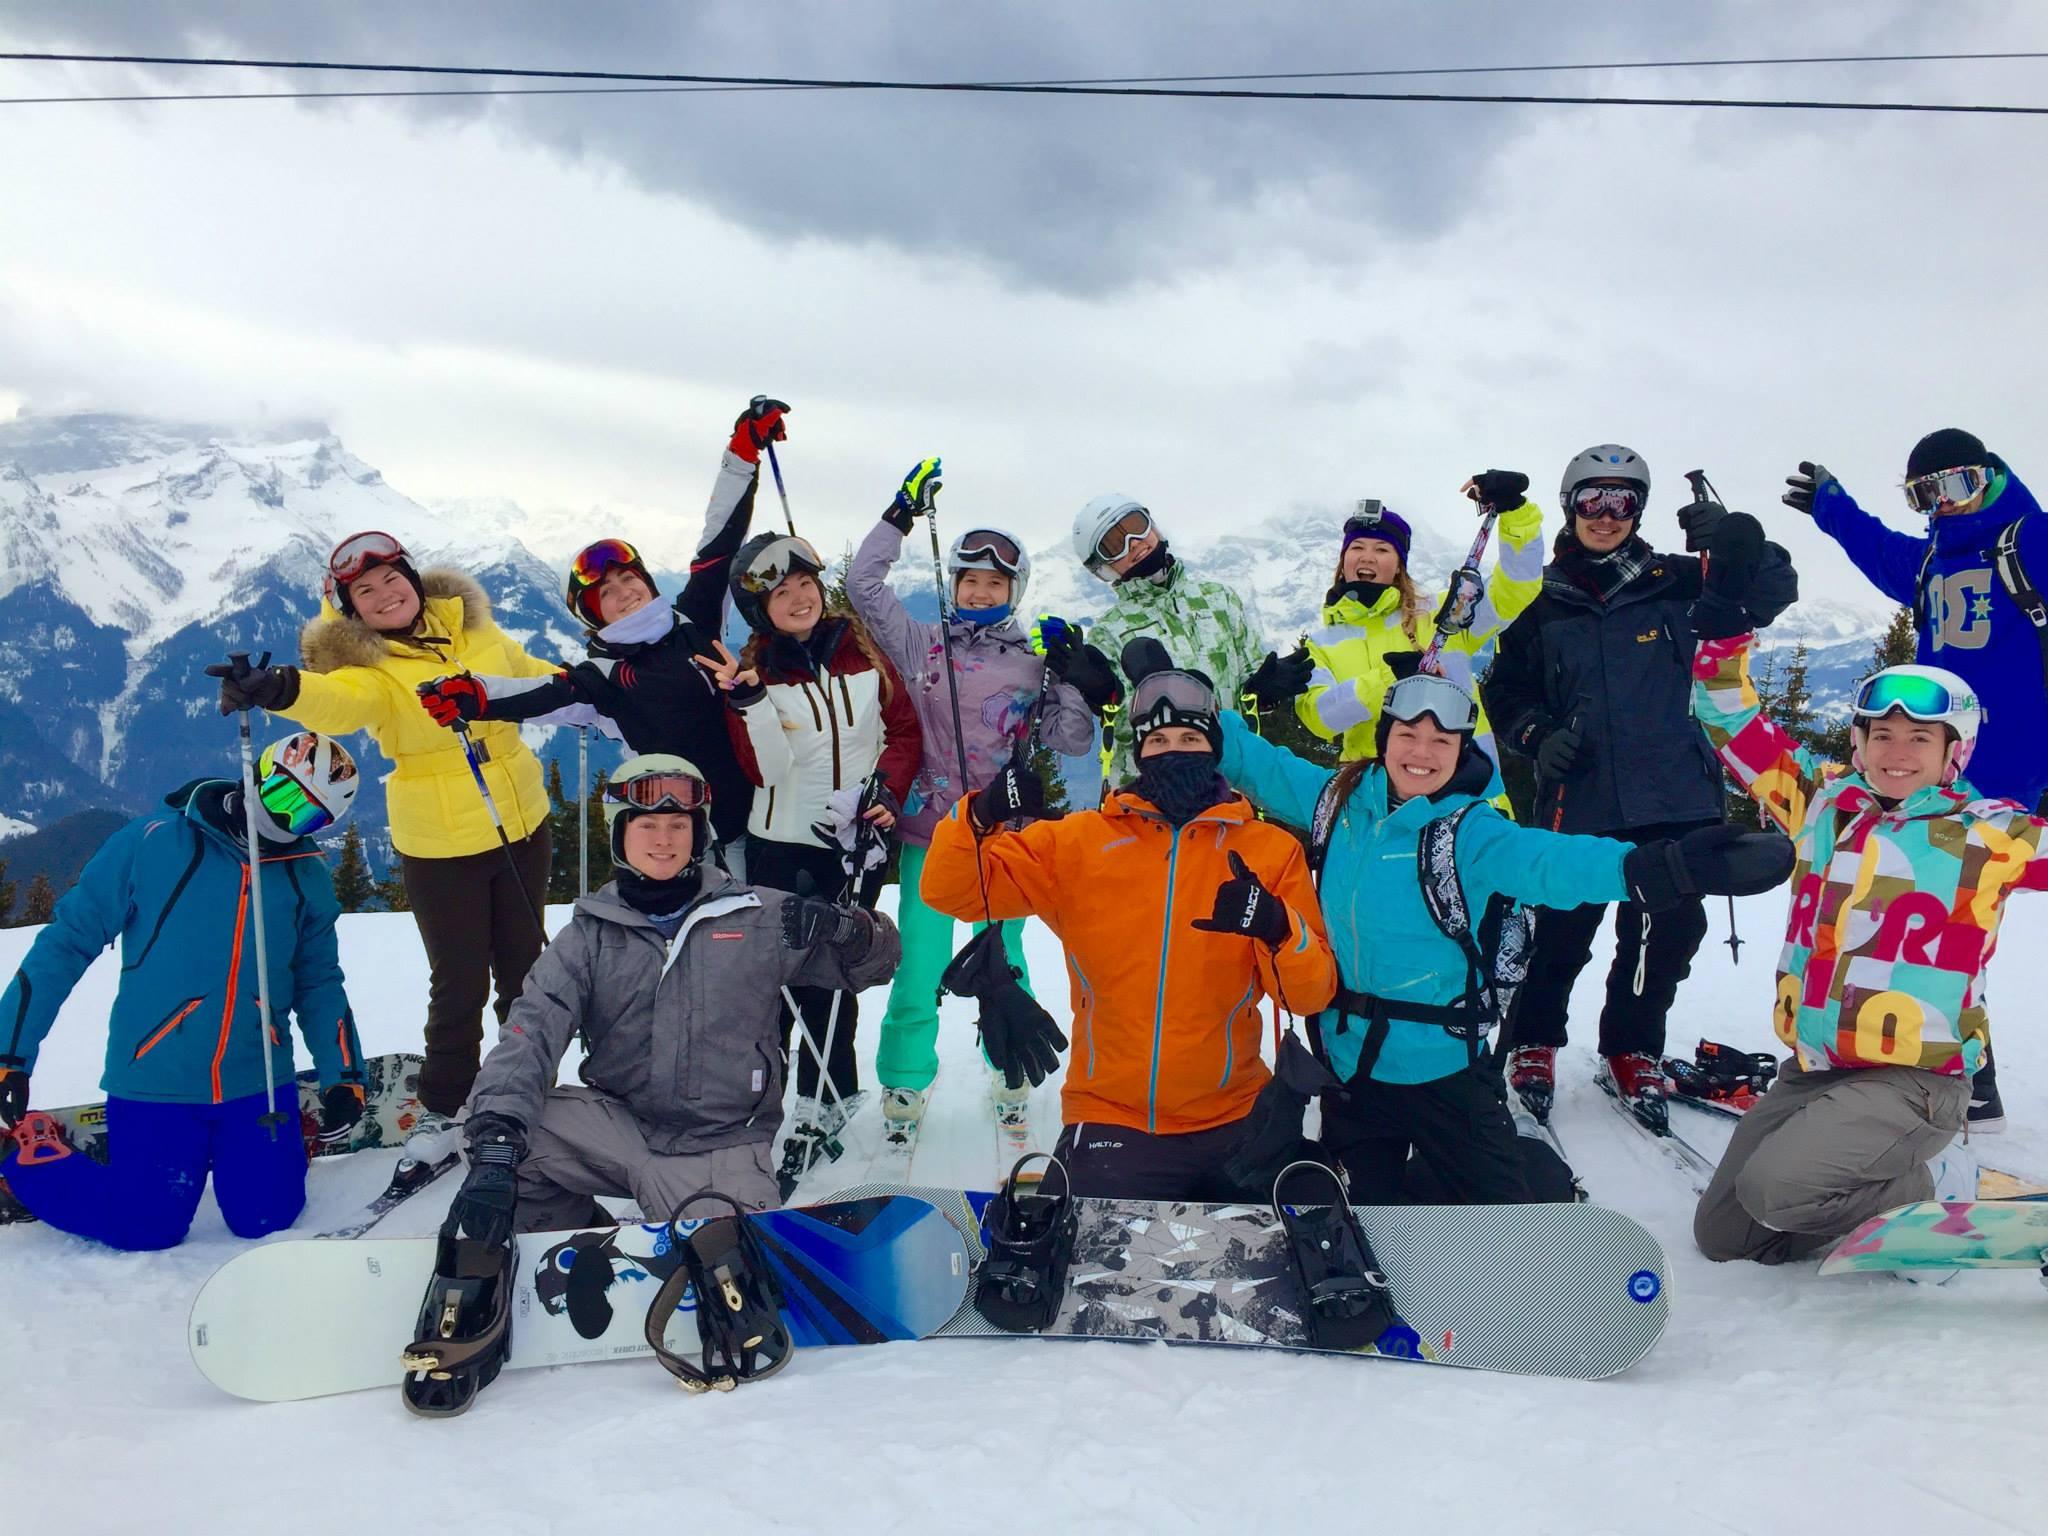 2015 Ski Trip to Villars: Student Stories